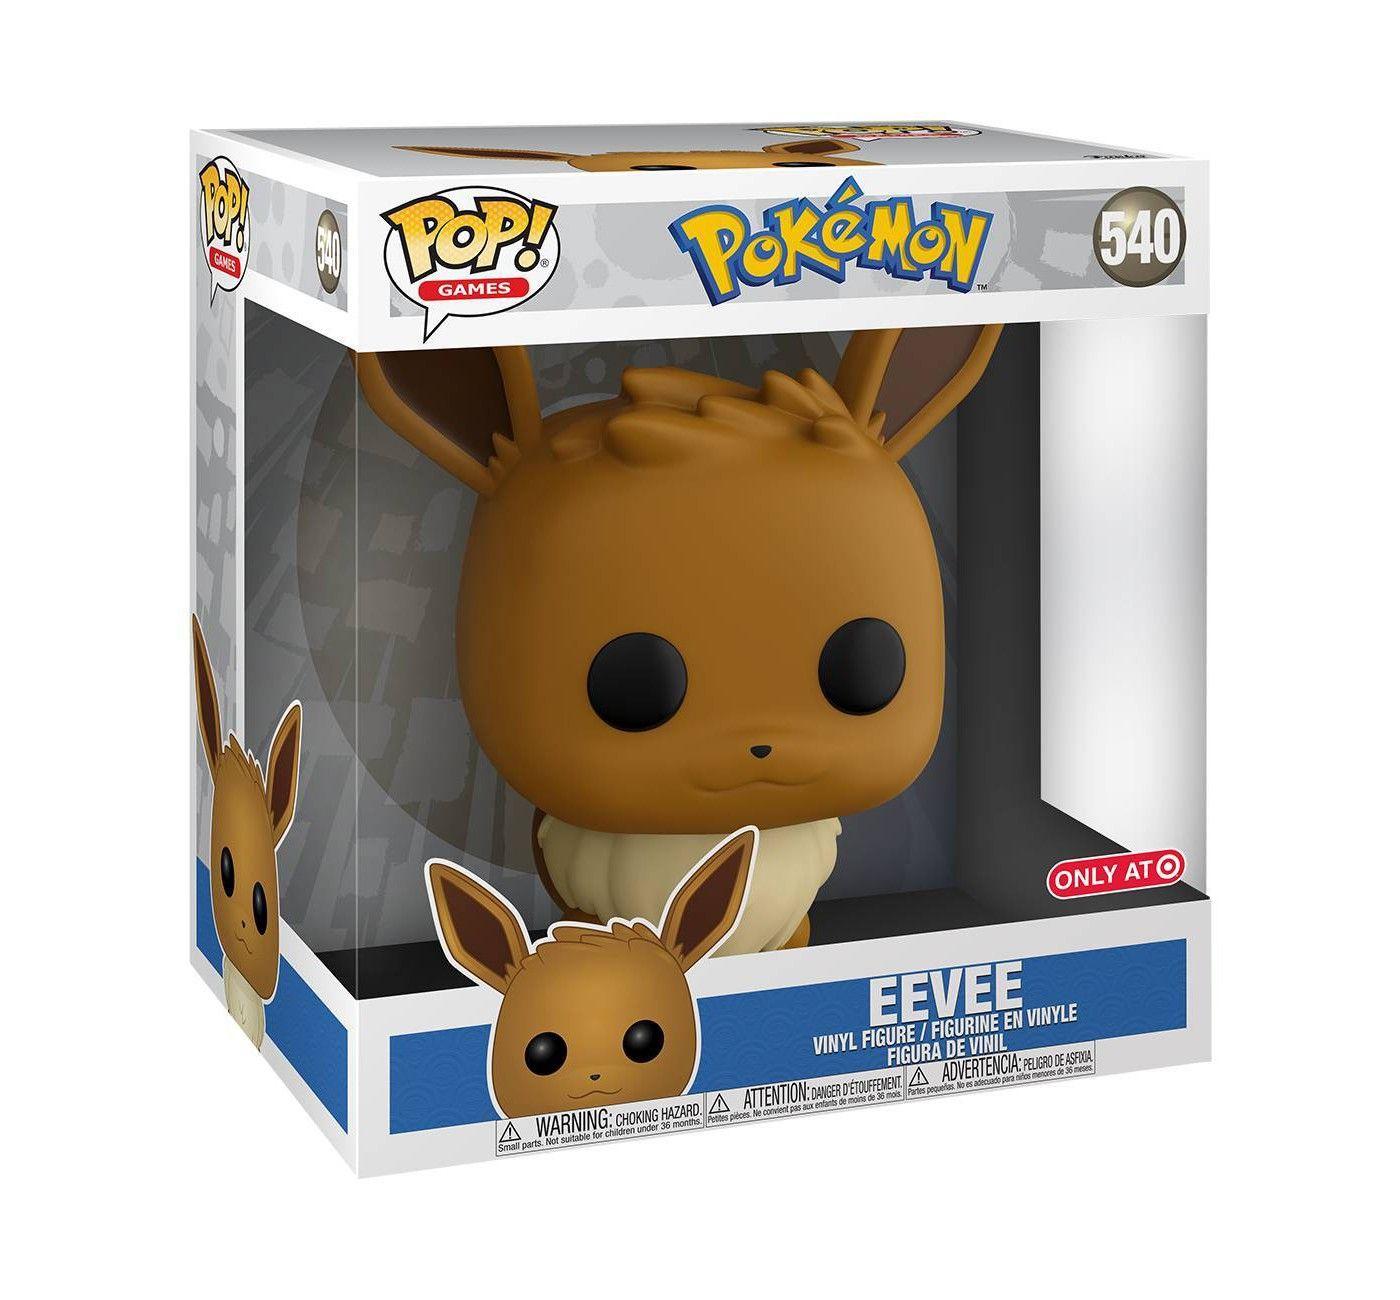 Funko Pop Games Pokemon 10 Eevee Target Exclusive Affiliate Games Ad Pokemon Funko In 2020 Vinyl Figures Pokemon Pokemon Eevee